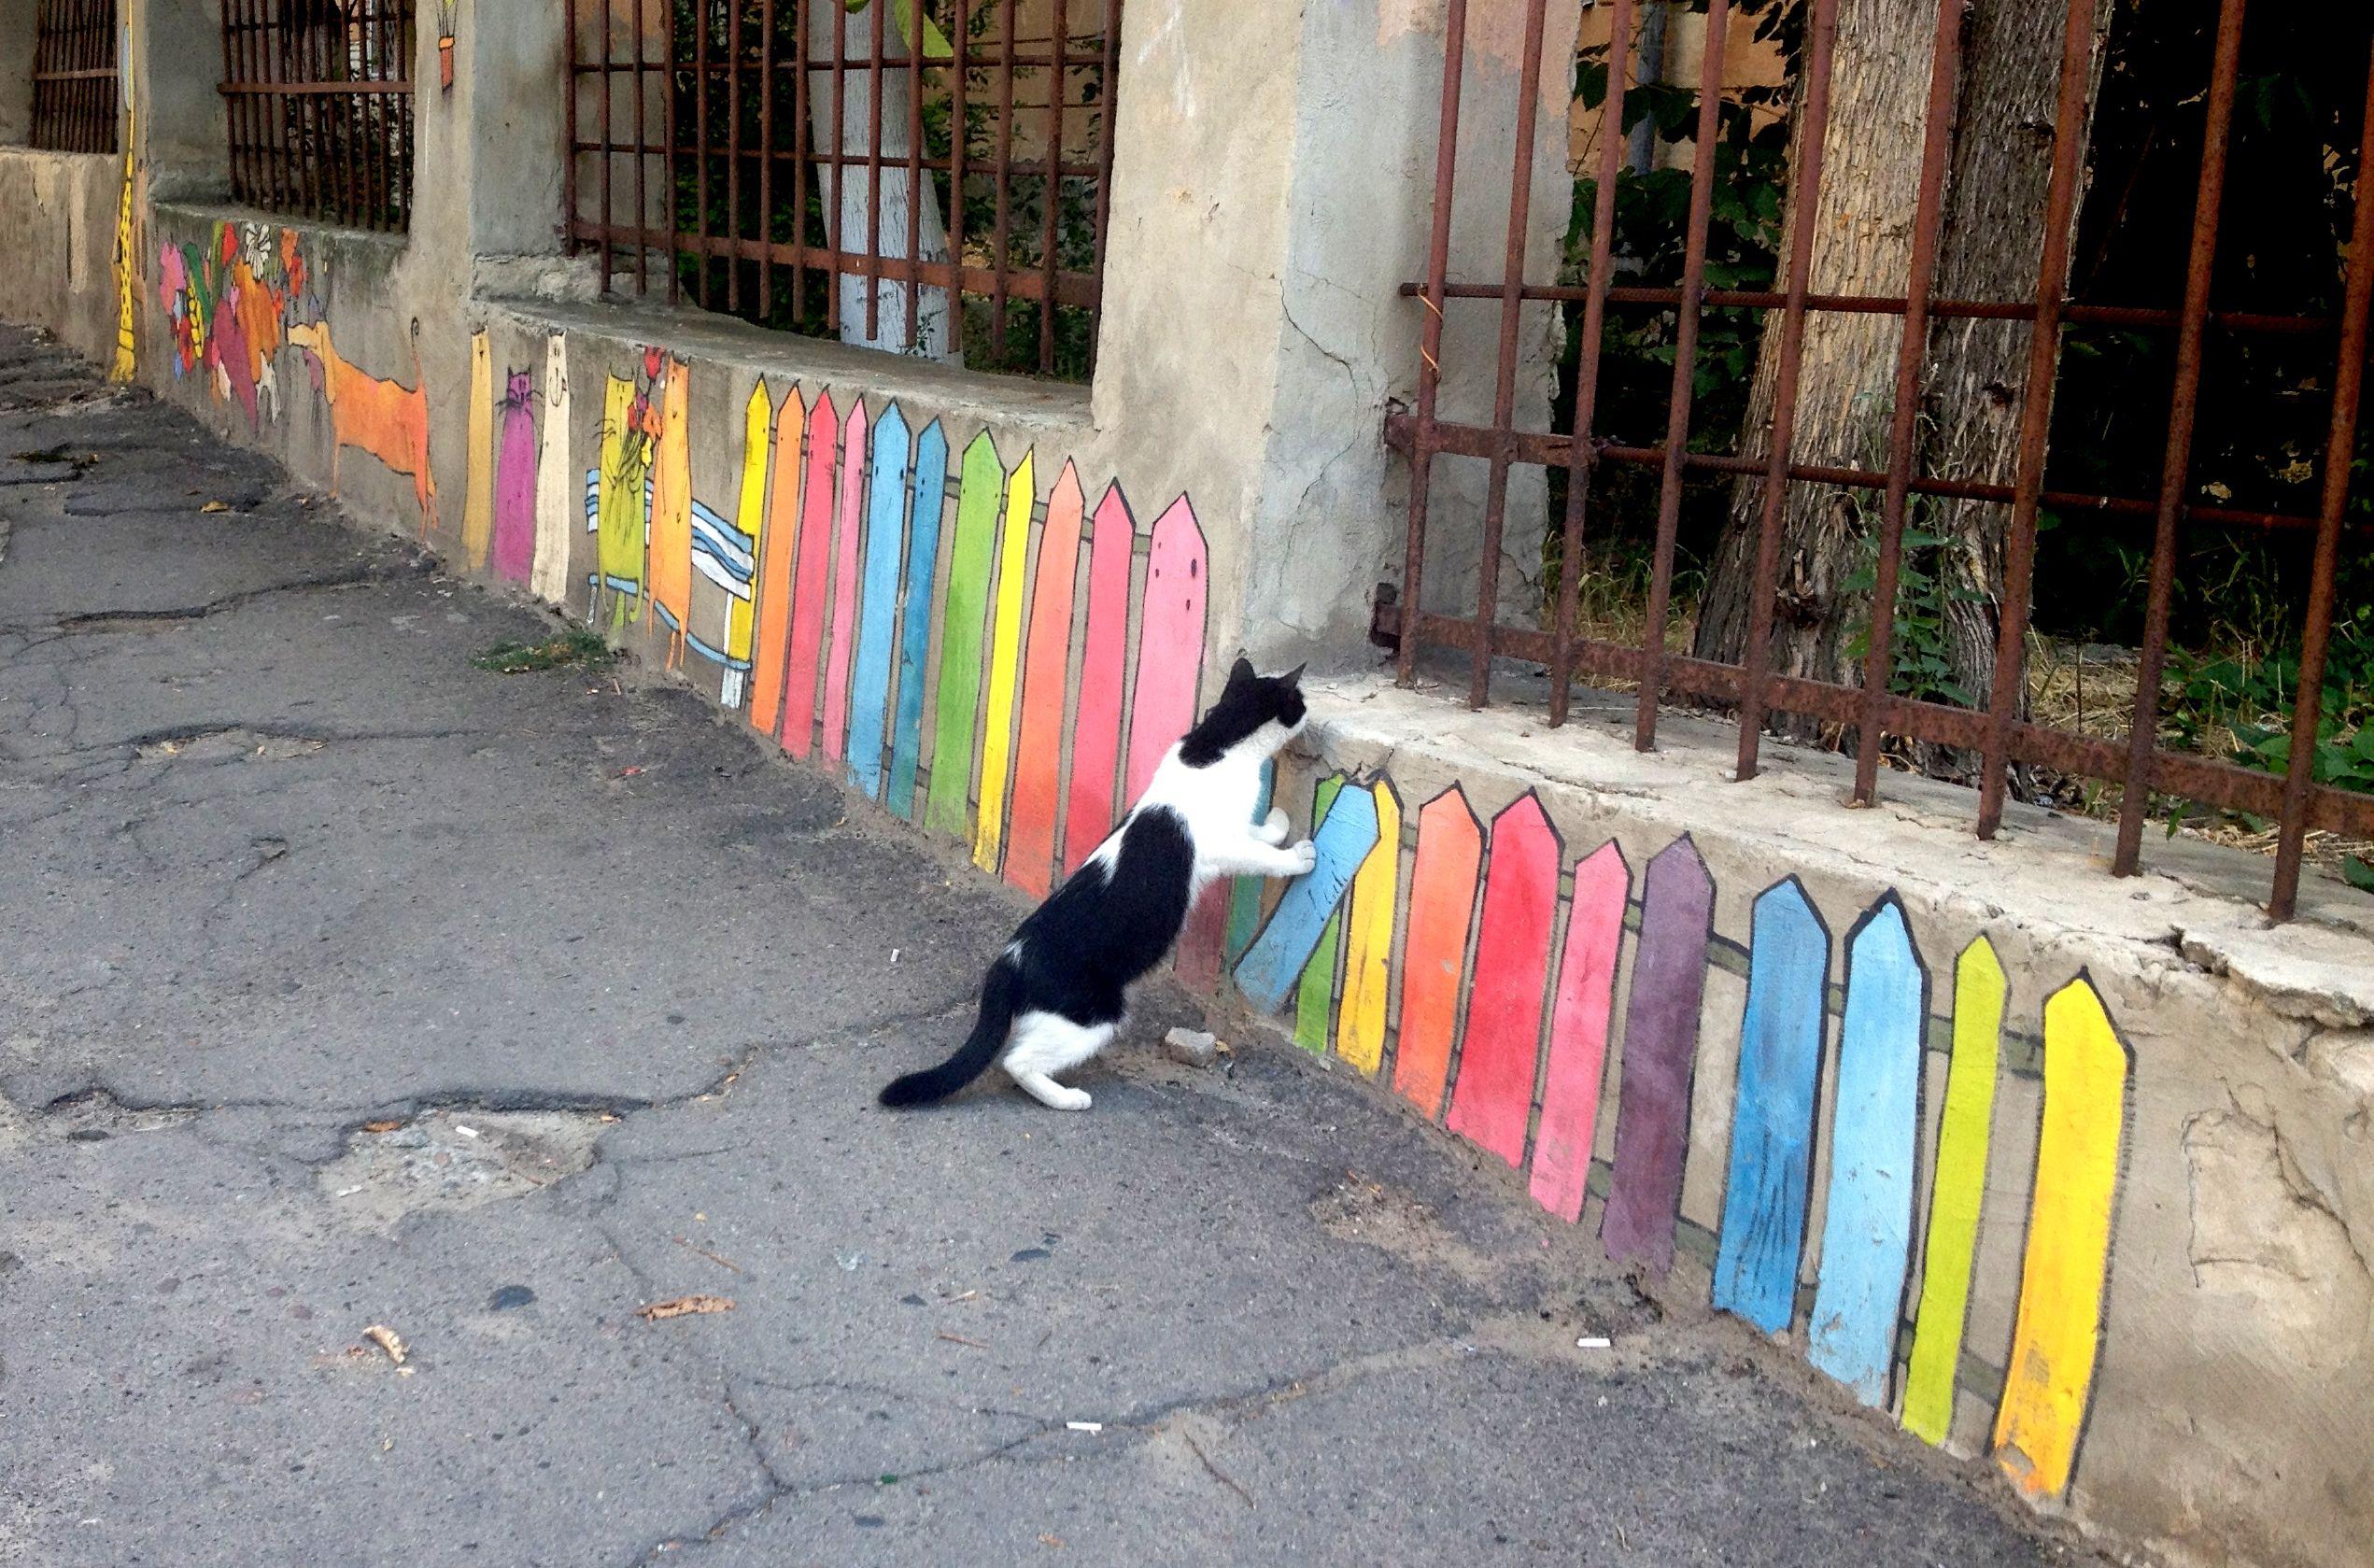 Кот Херсона.Kherson. Ukraine. Tourism. South. Cat. Cats. Courtyard. City. Animals.